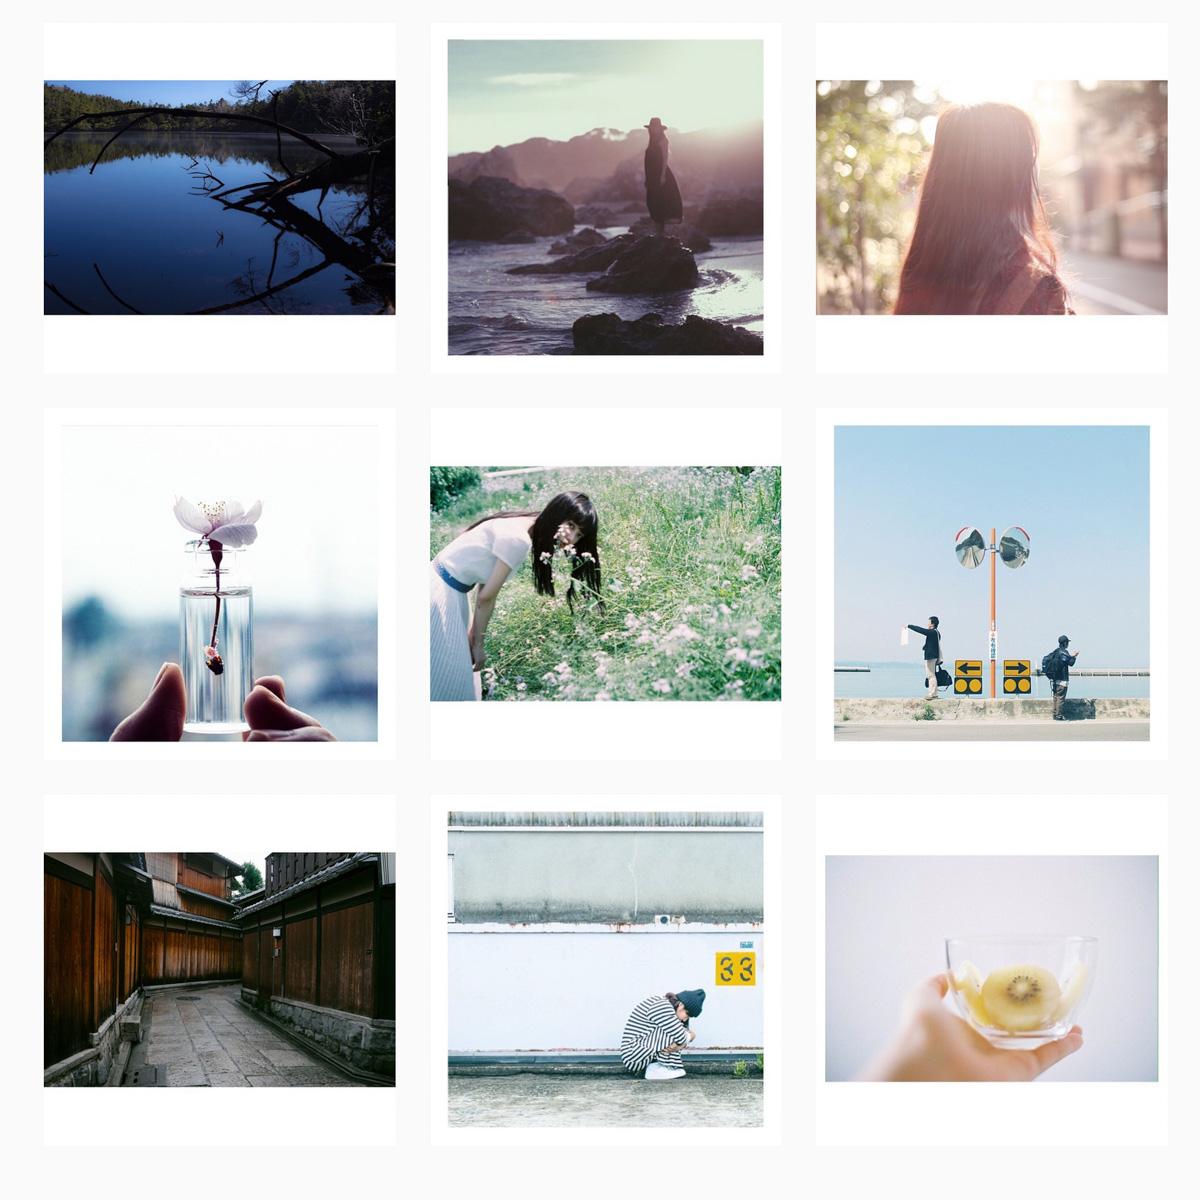 Tuck-screenshot-instagram.com 2015-07-03 17-22-17